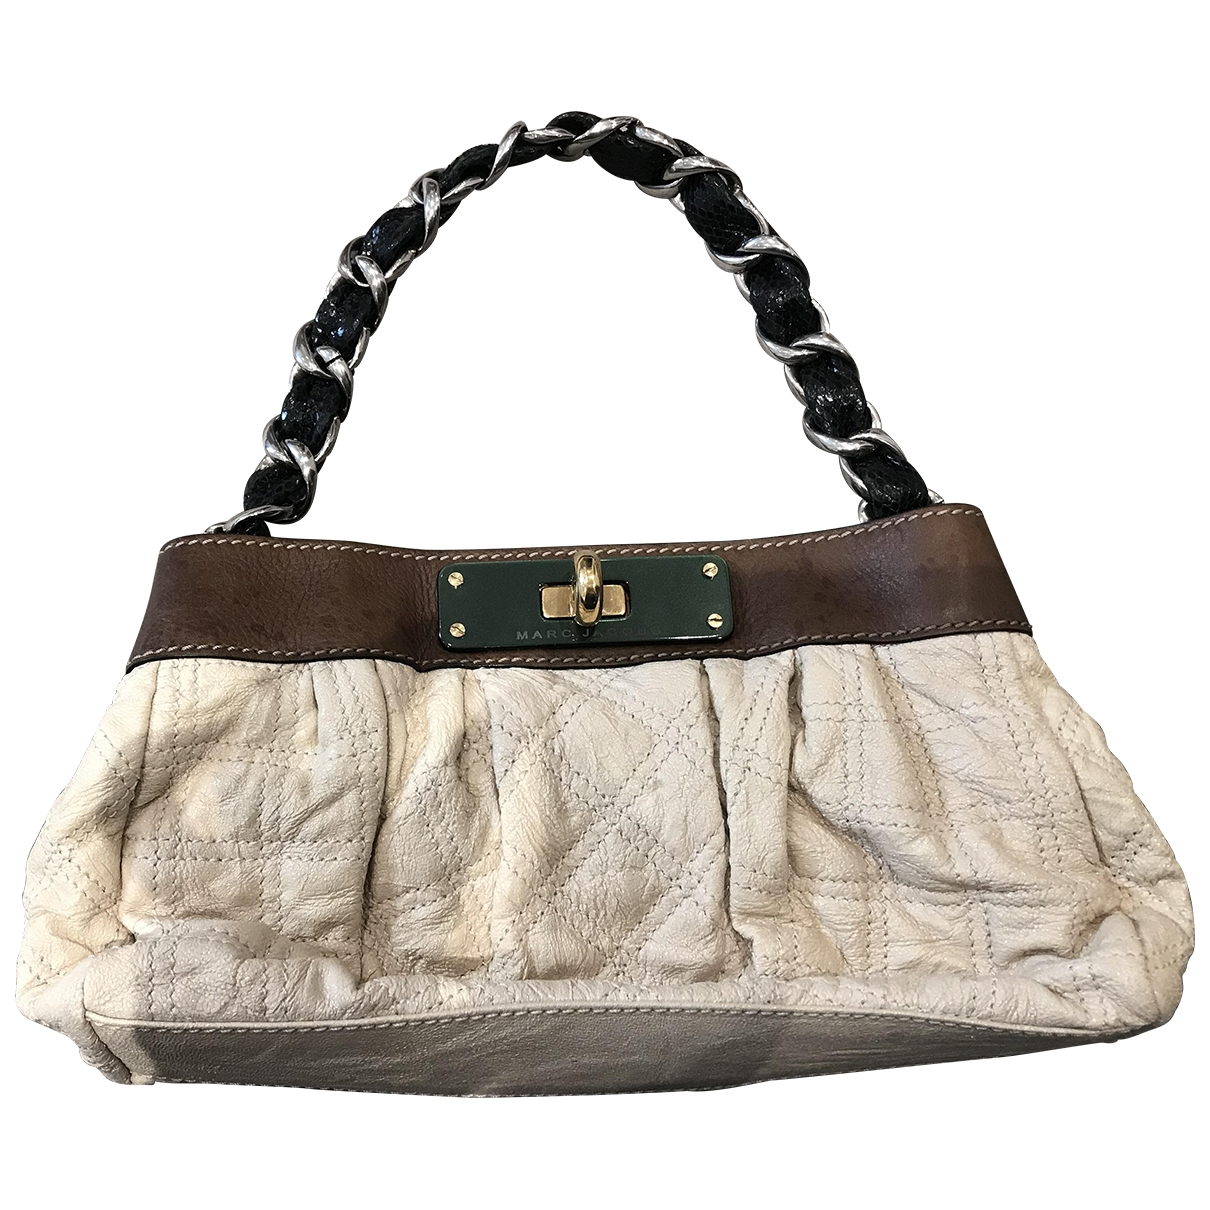 Marc Jacobs \N Ecru Leather handbag for Women \N